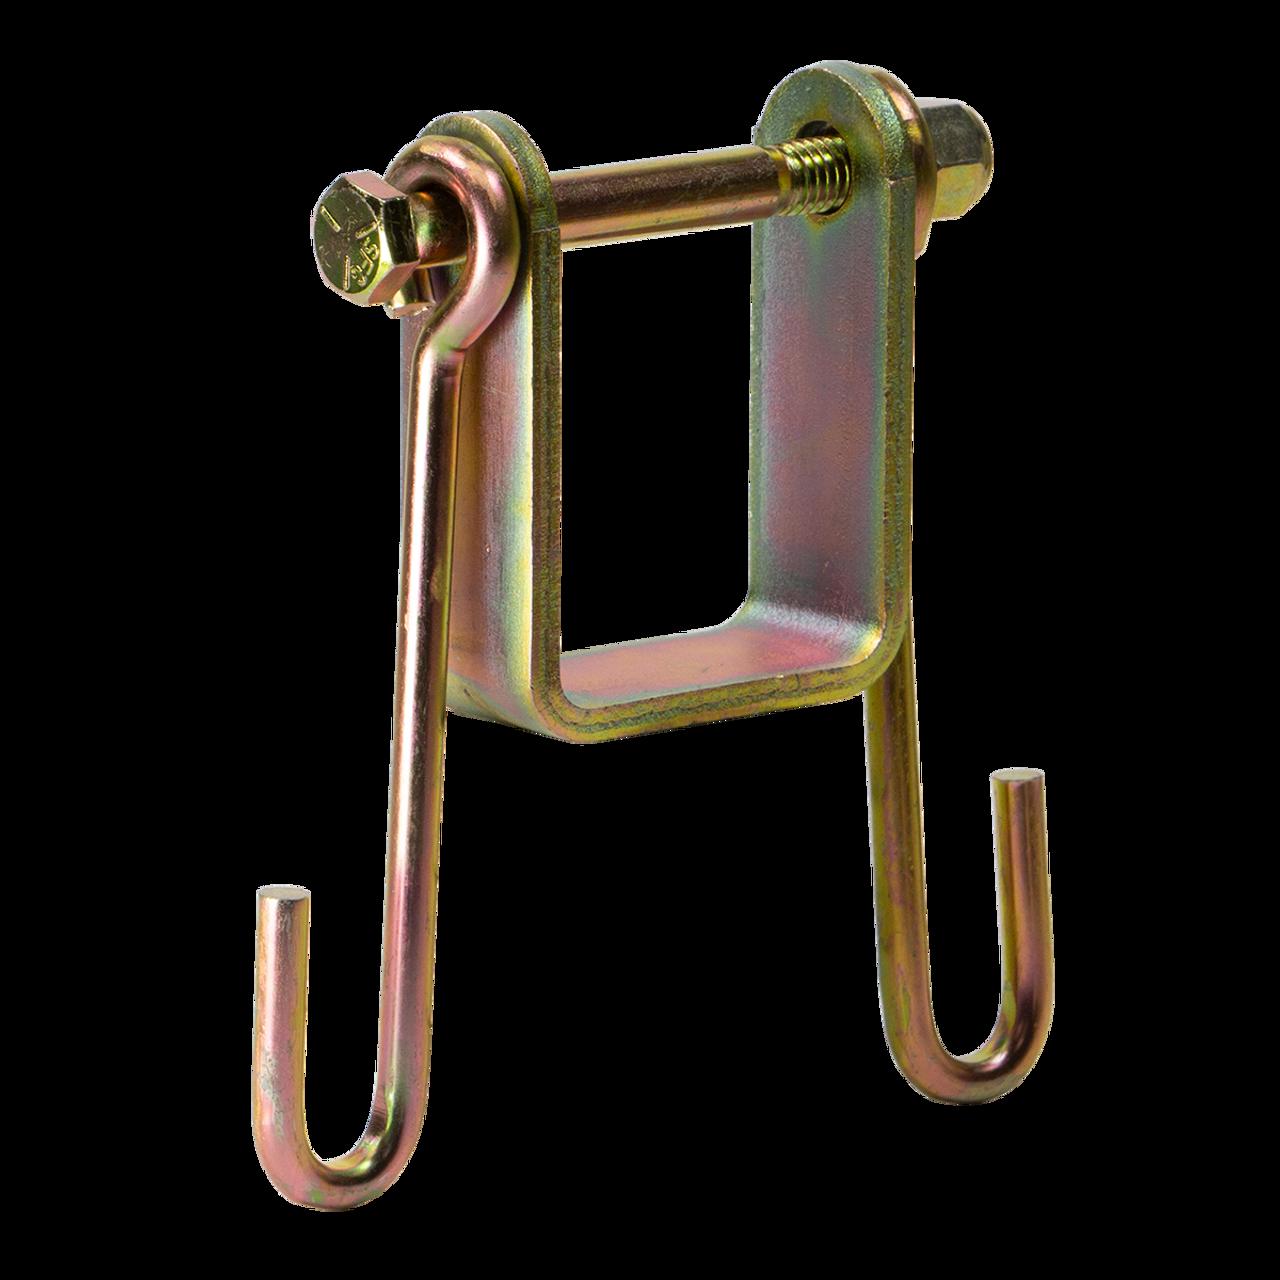 "45806 --- Trailer Safety Chain Holder Bracket for 2"" Shank"